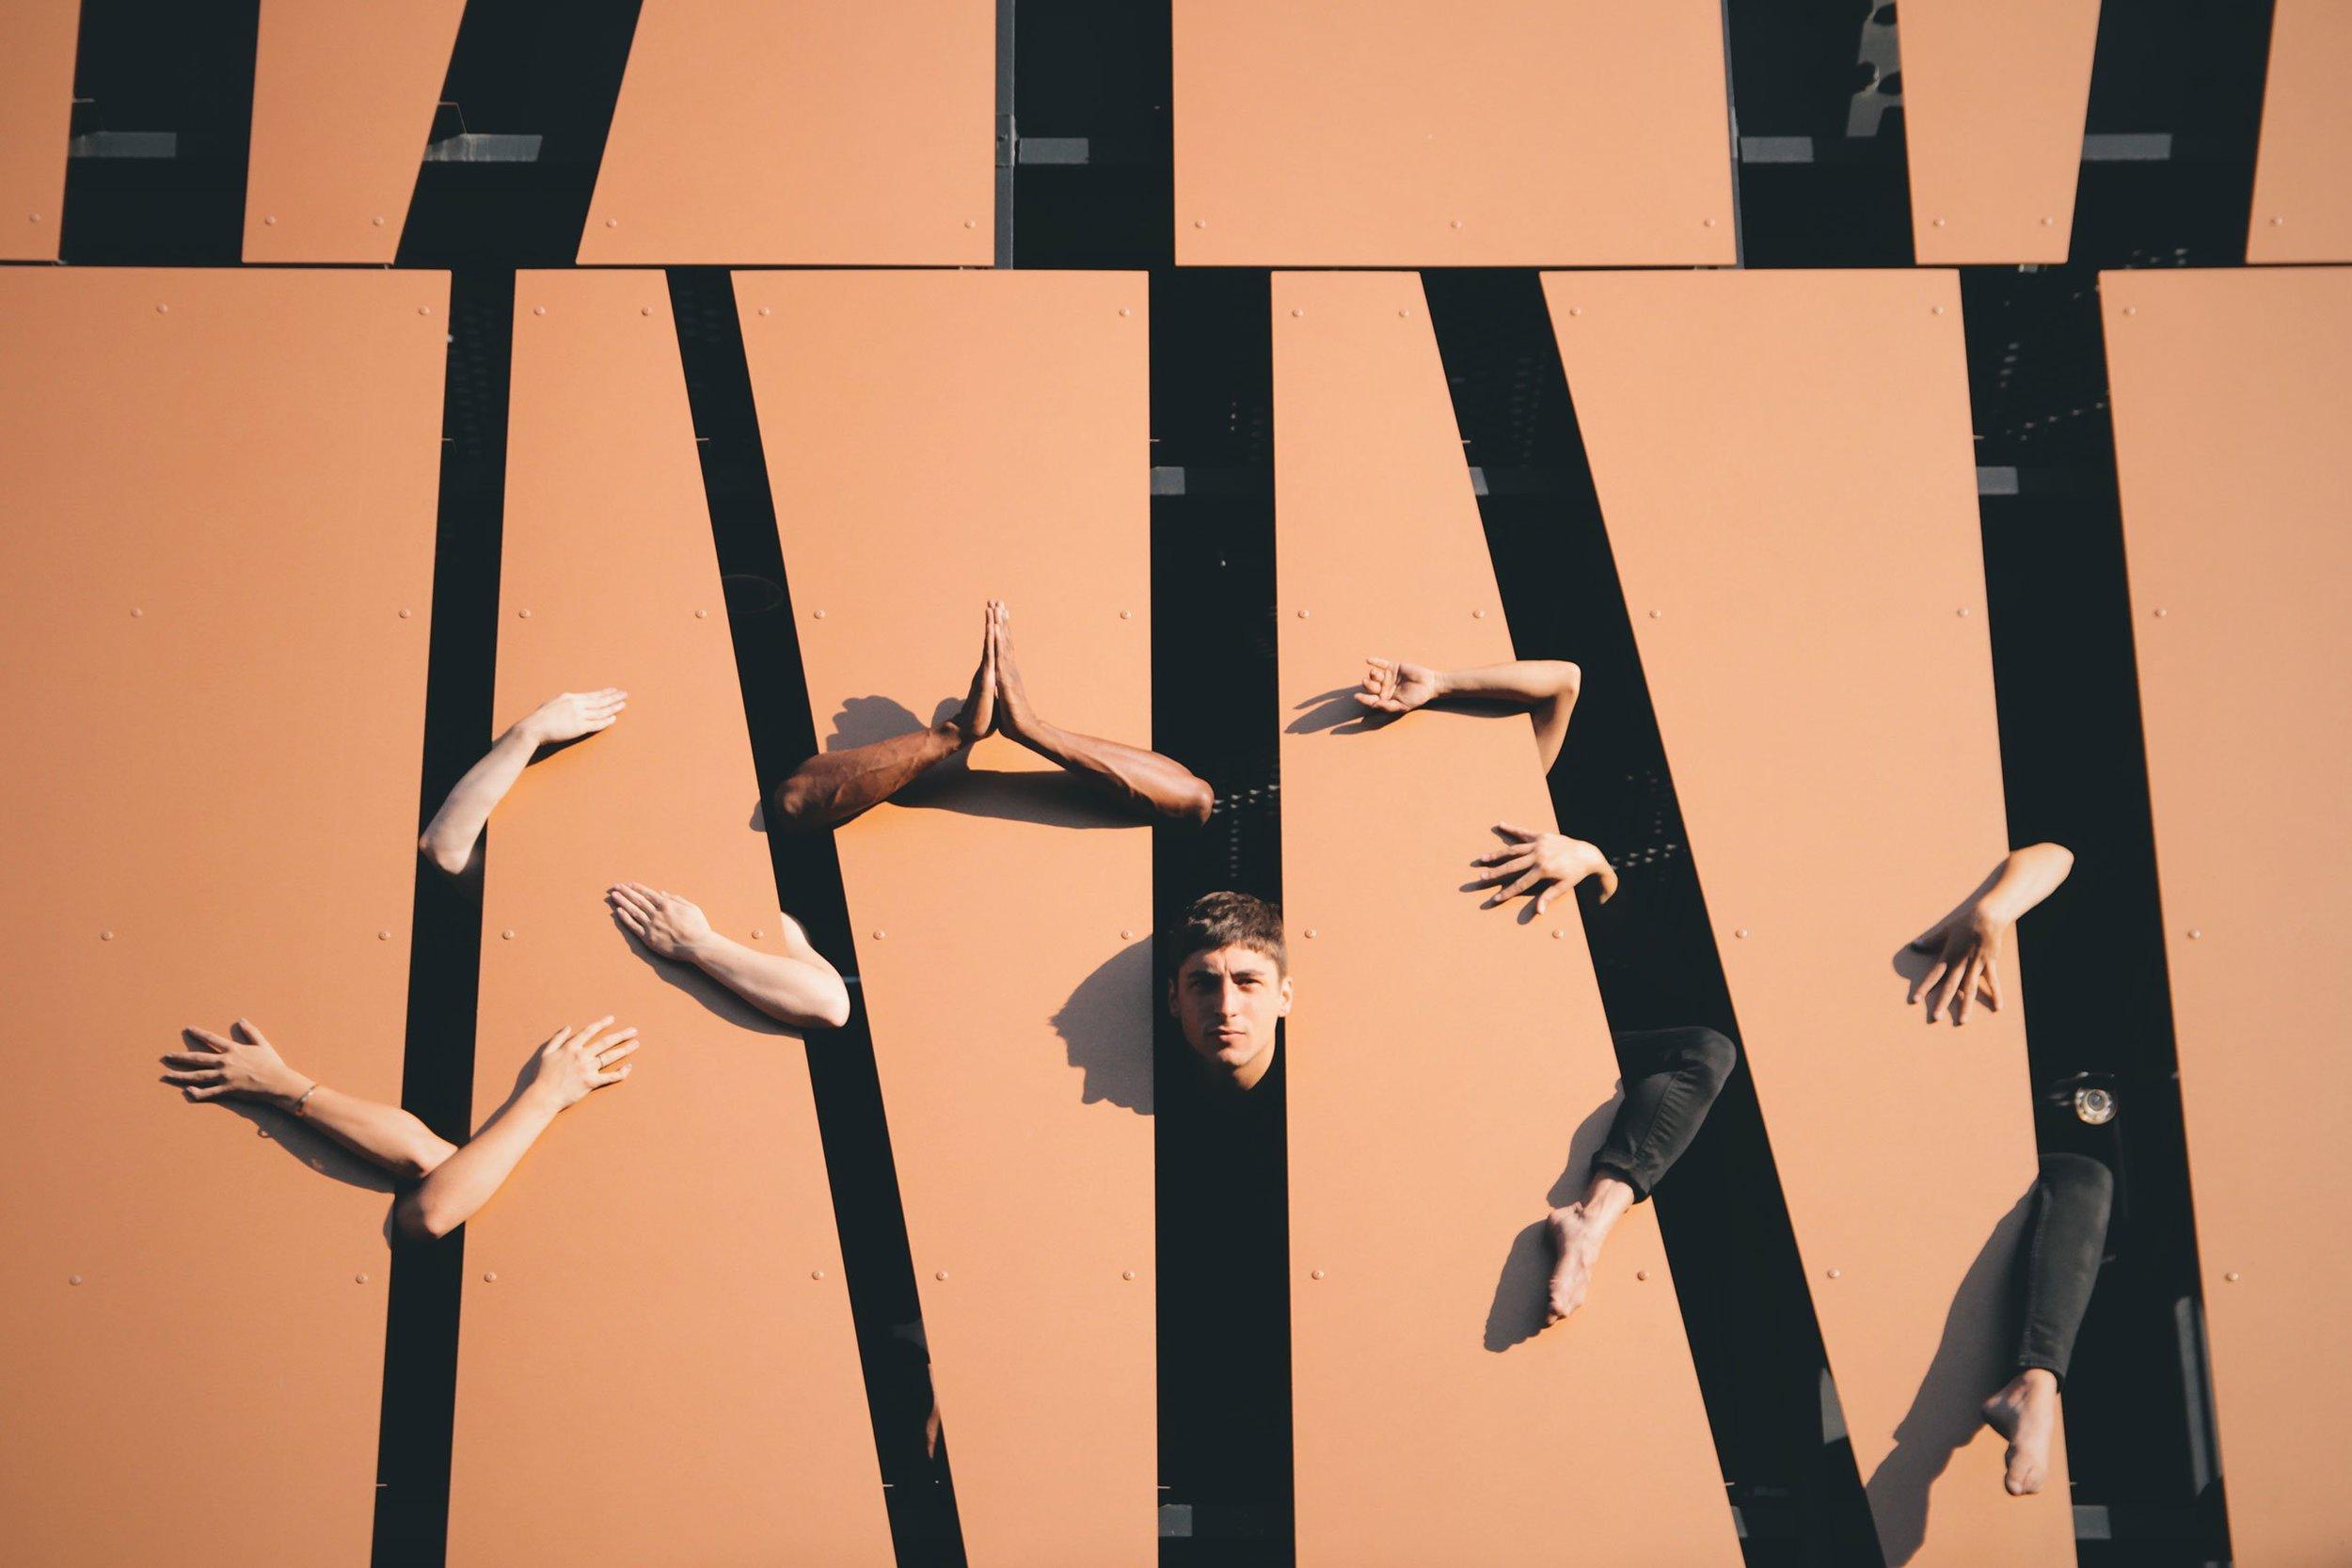 p4_cameras_and_dancers_jacob_jonas_the_company_yatzer.jpg